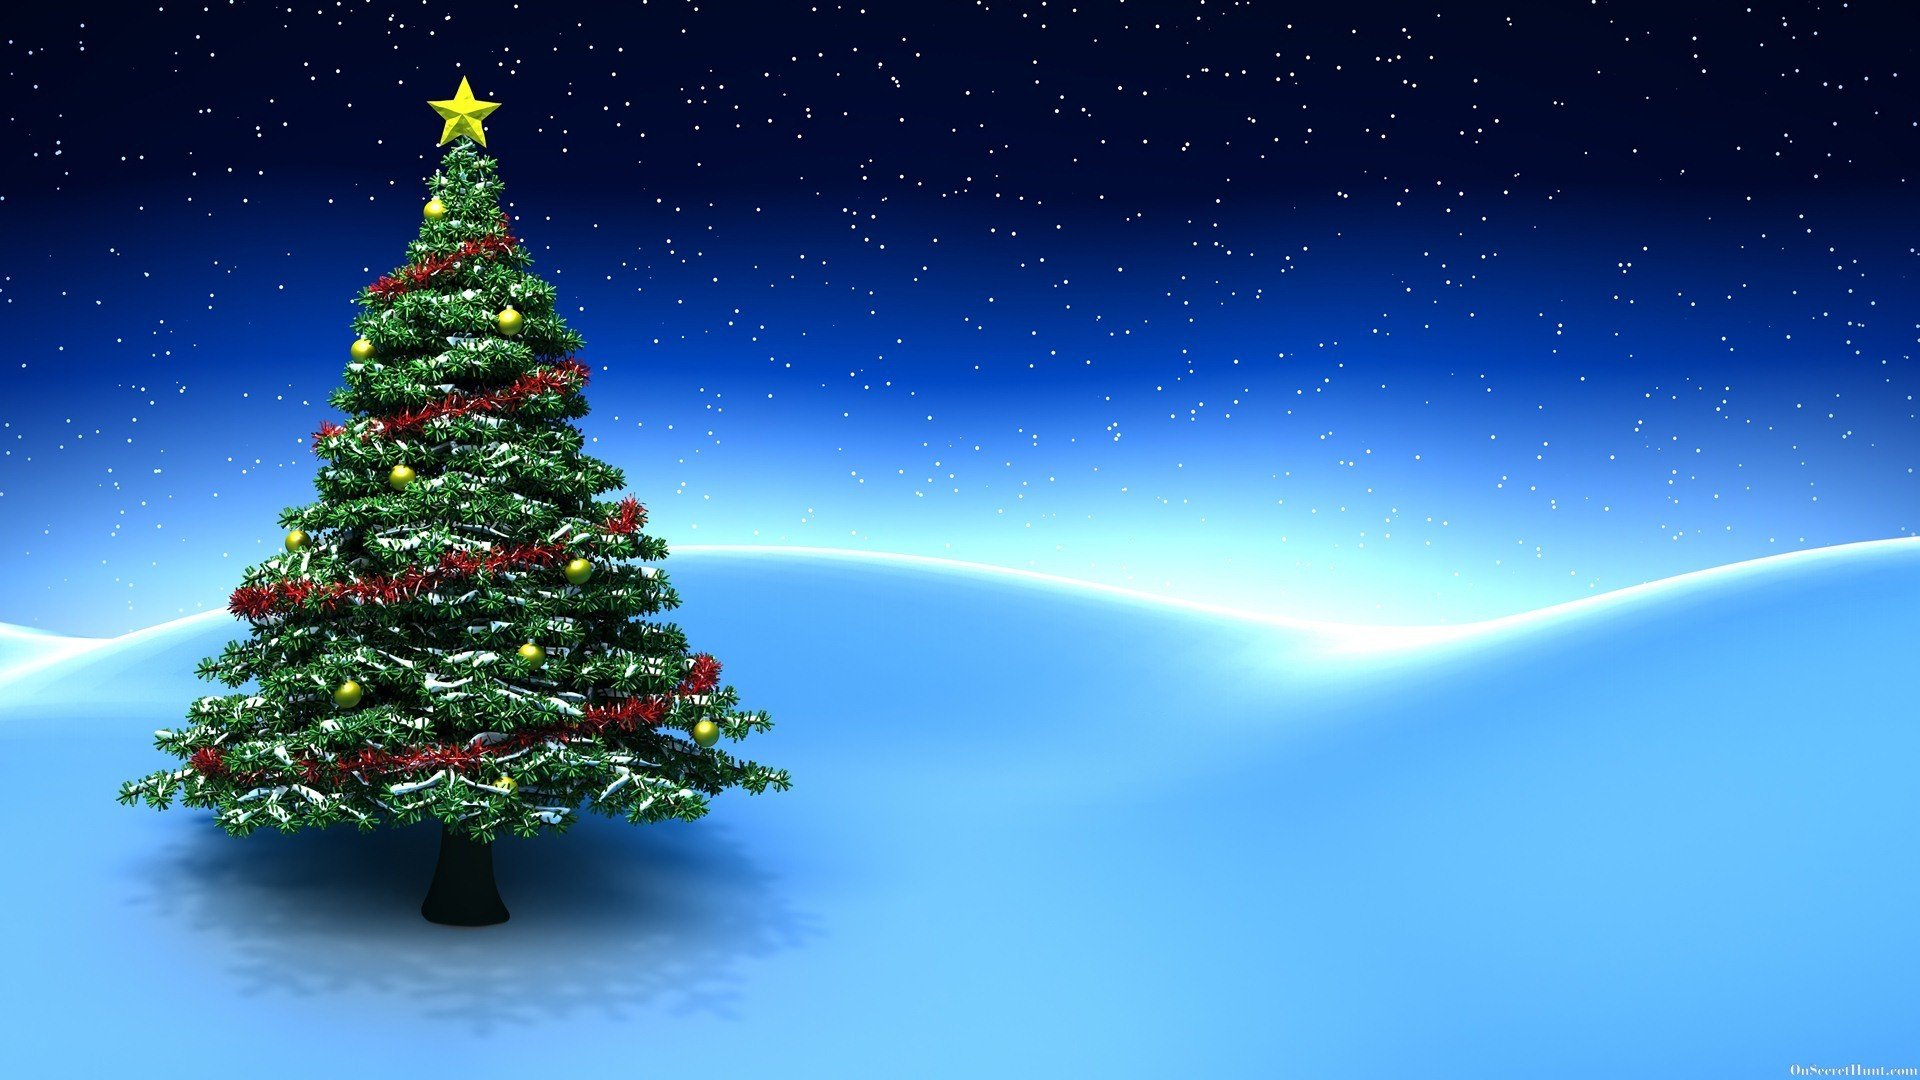 Res: 1920x1080, Animated Christmas Tree Wallpaper.